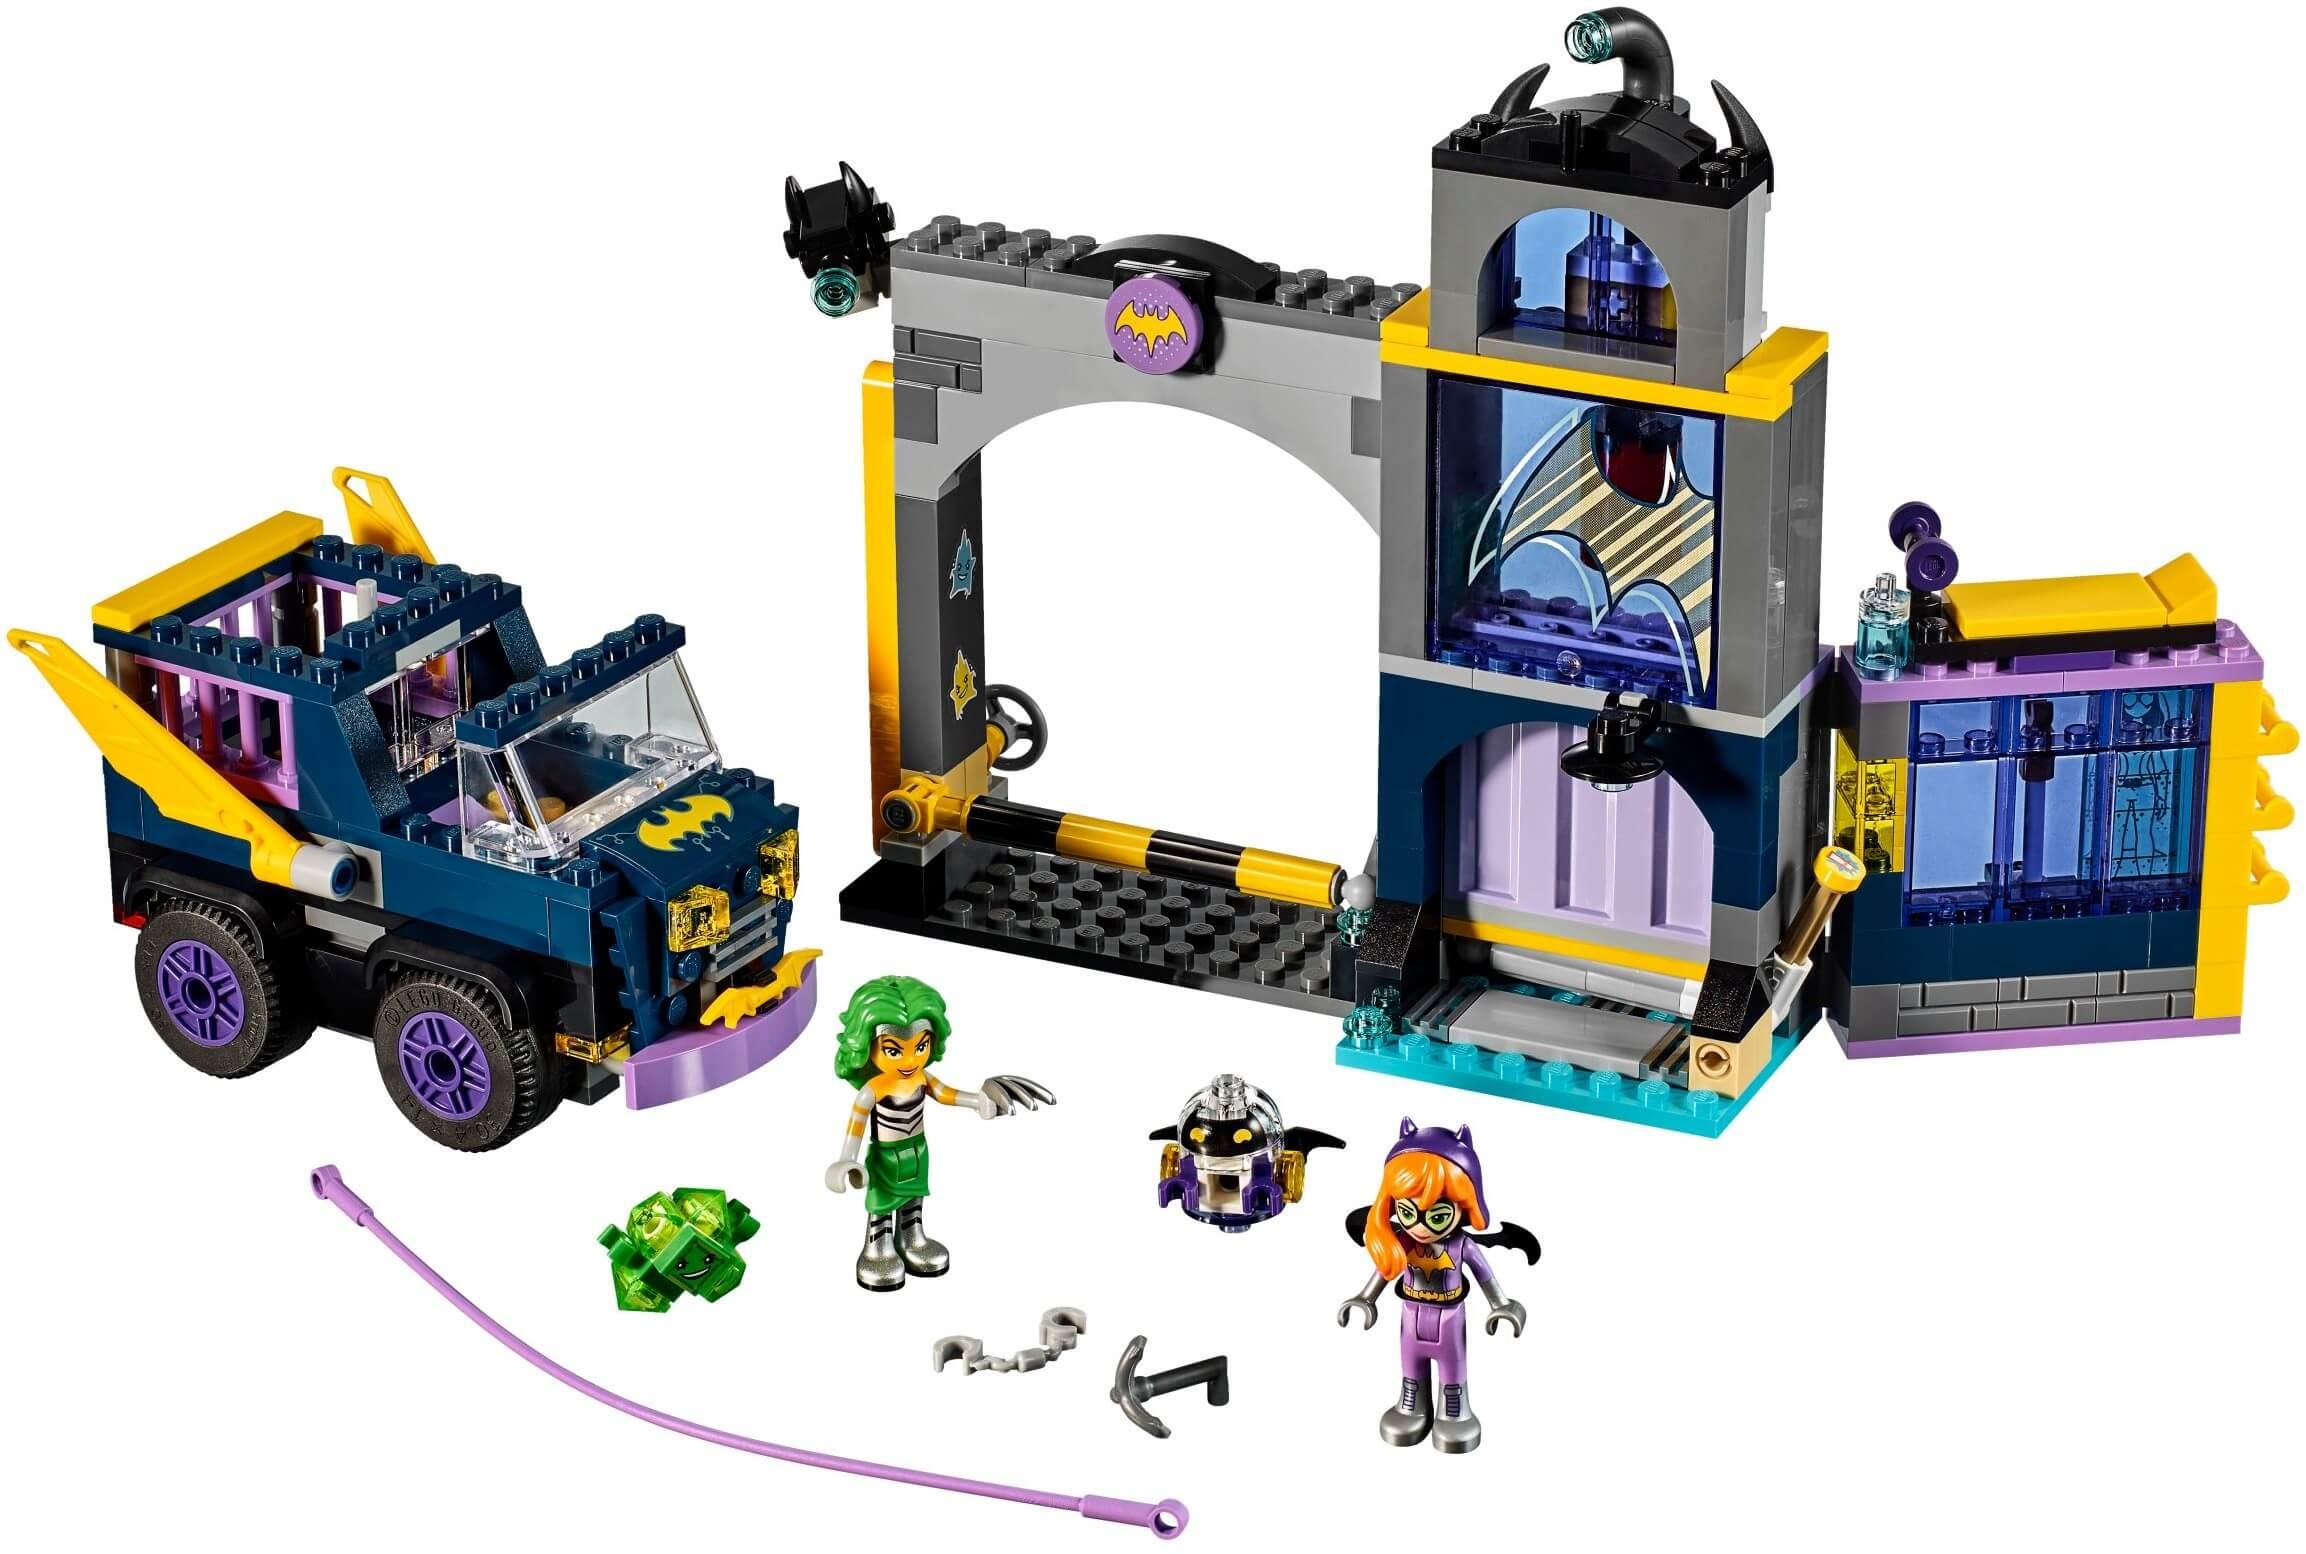 Mua đồ chơi LEGO 41237 - LEGO Super Hero Girls 41237 - Căn Cứ Bí Mật của Batgirl (LEGO Super Hero Girls Batgirl Secret Bunker)